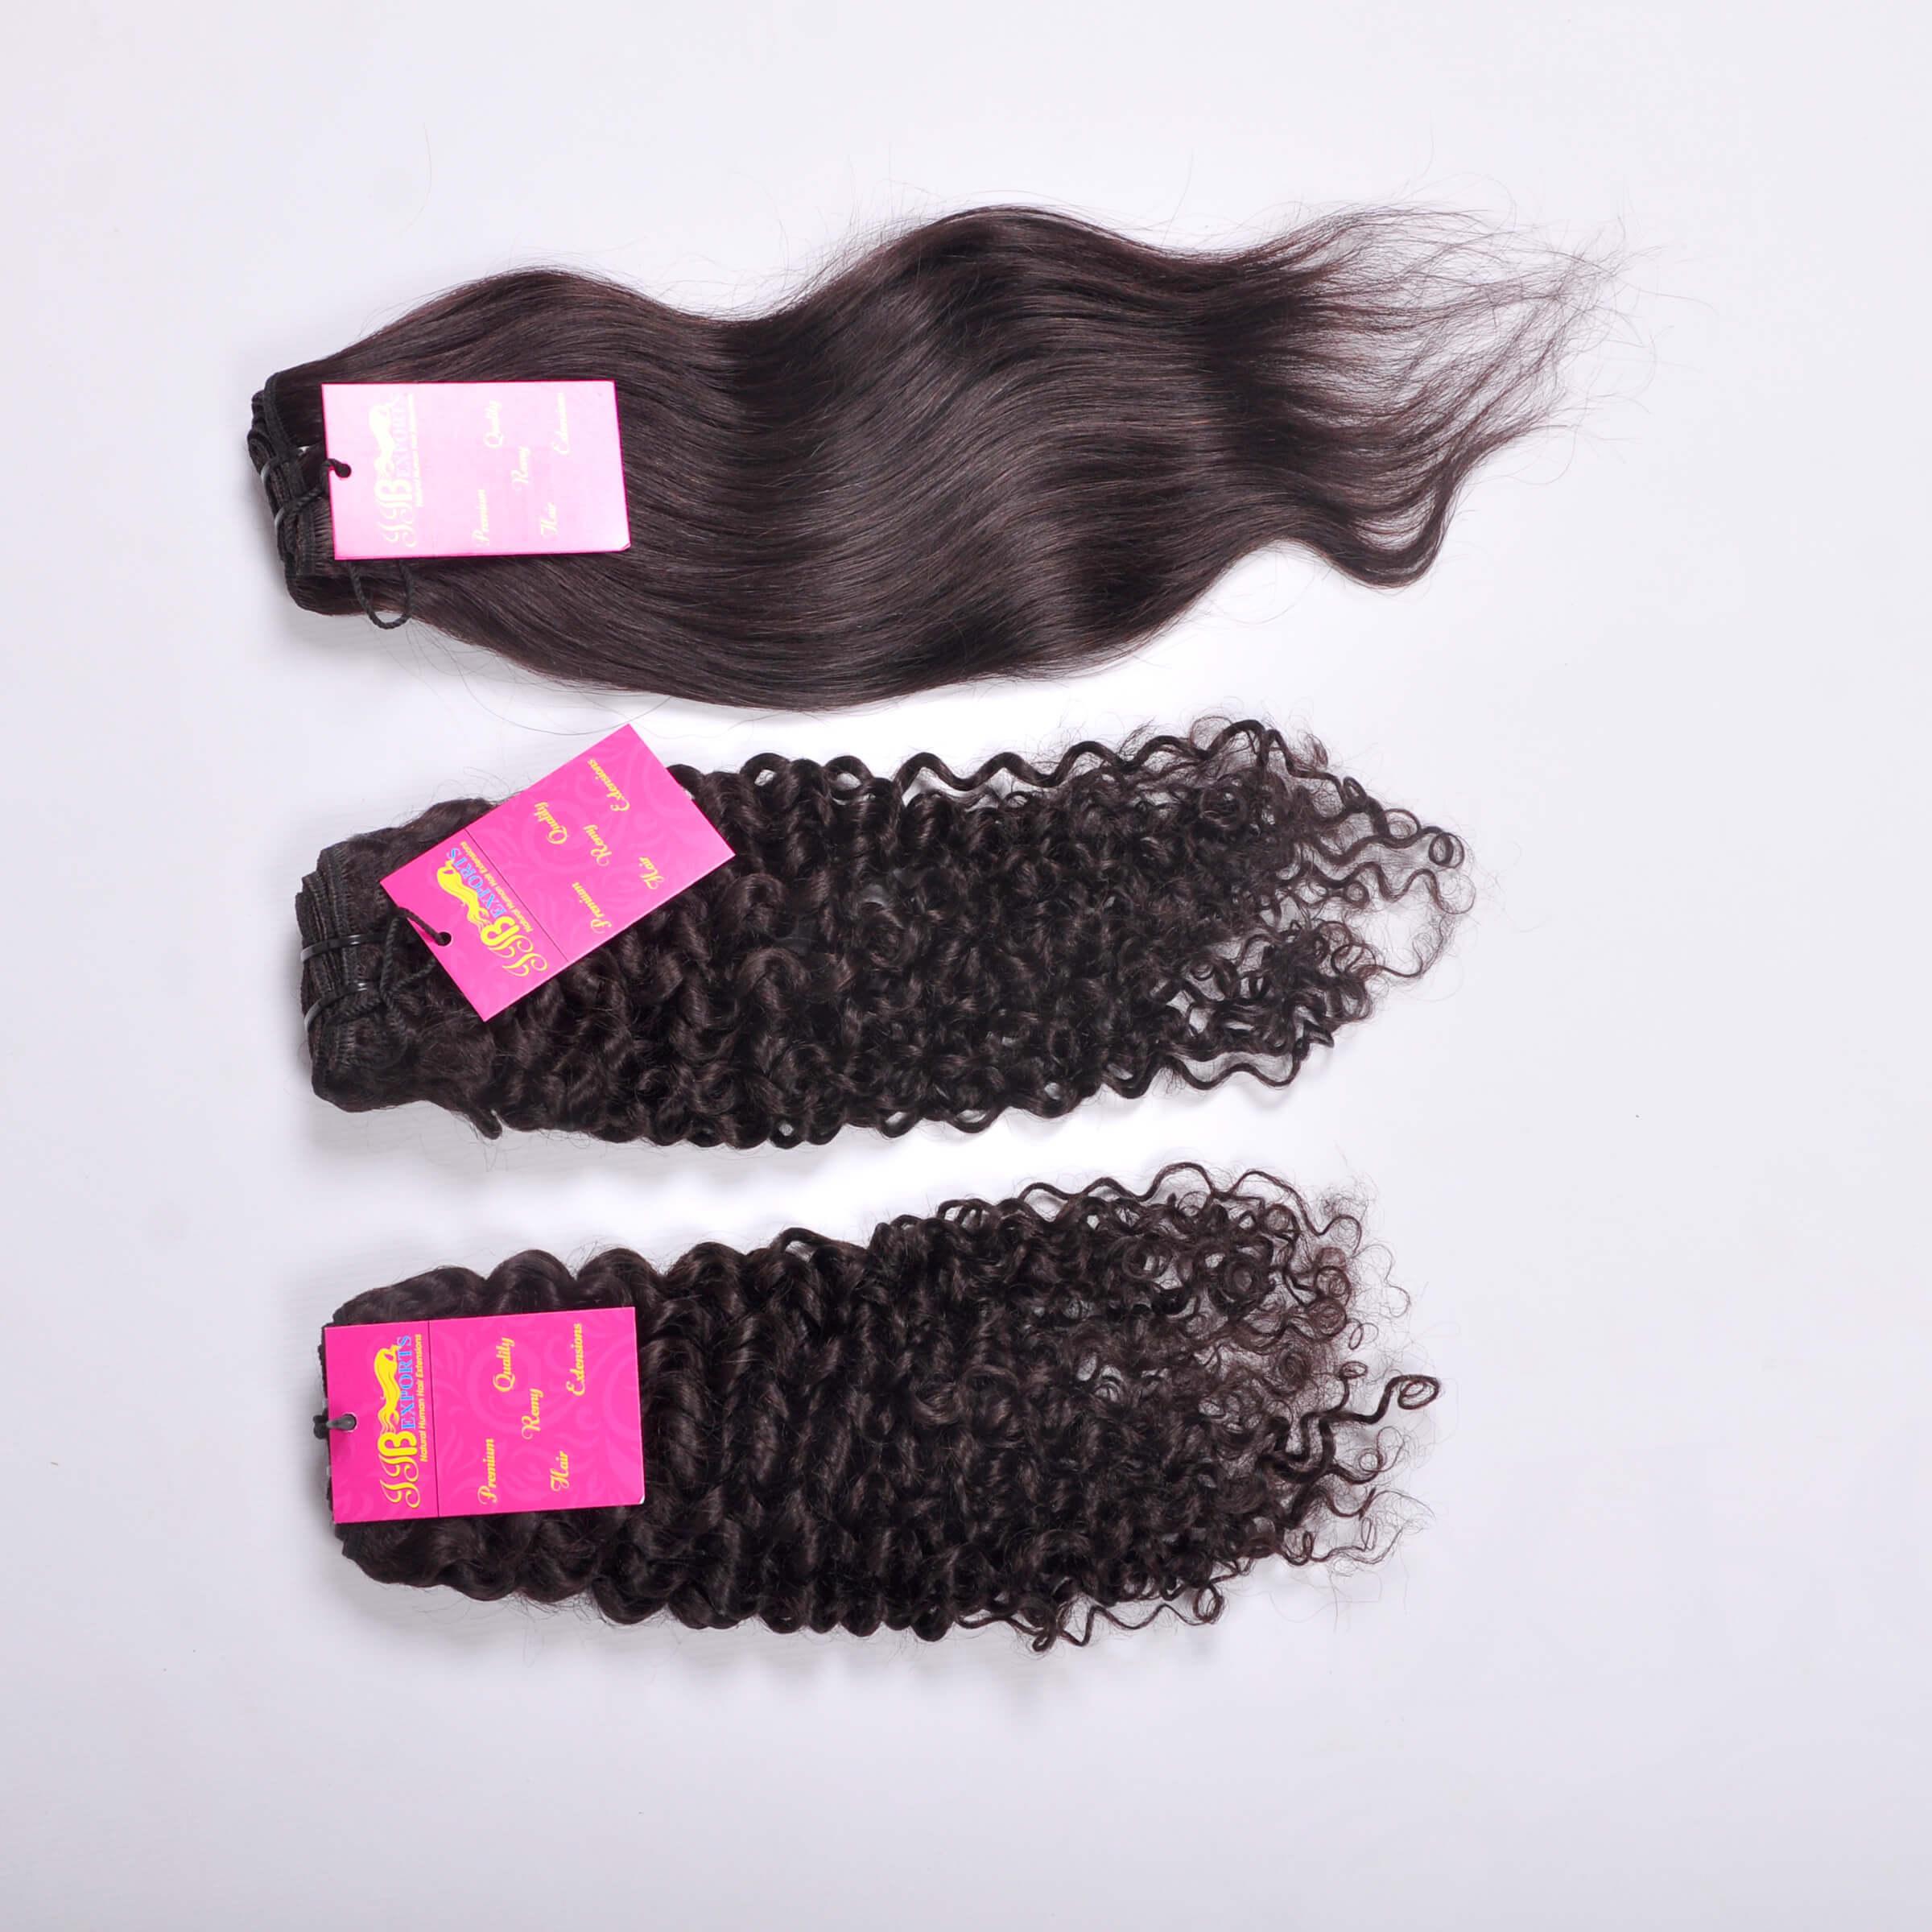 Virgin Cuticle Aligned Soft & Silky Indian 100% Natural Straight/wavy/bodywave Raw Cambodian Human Hair Bundle